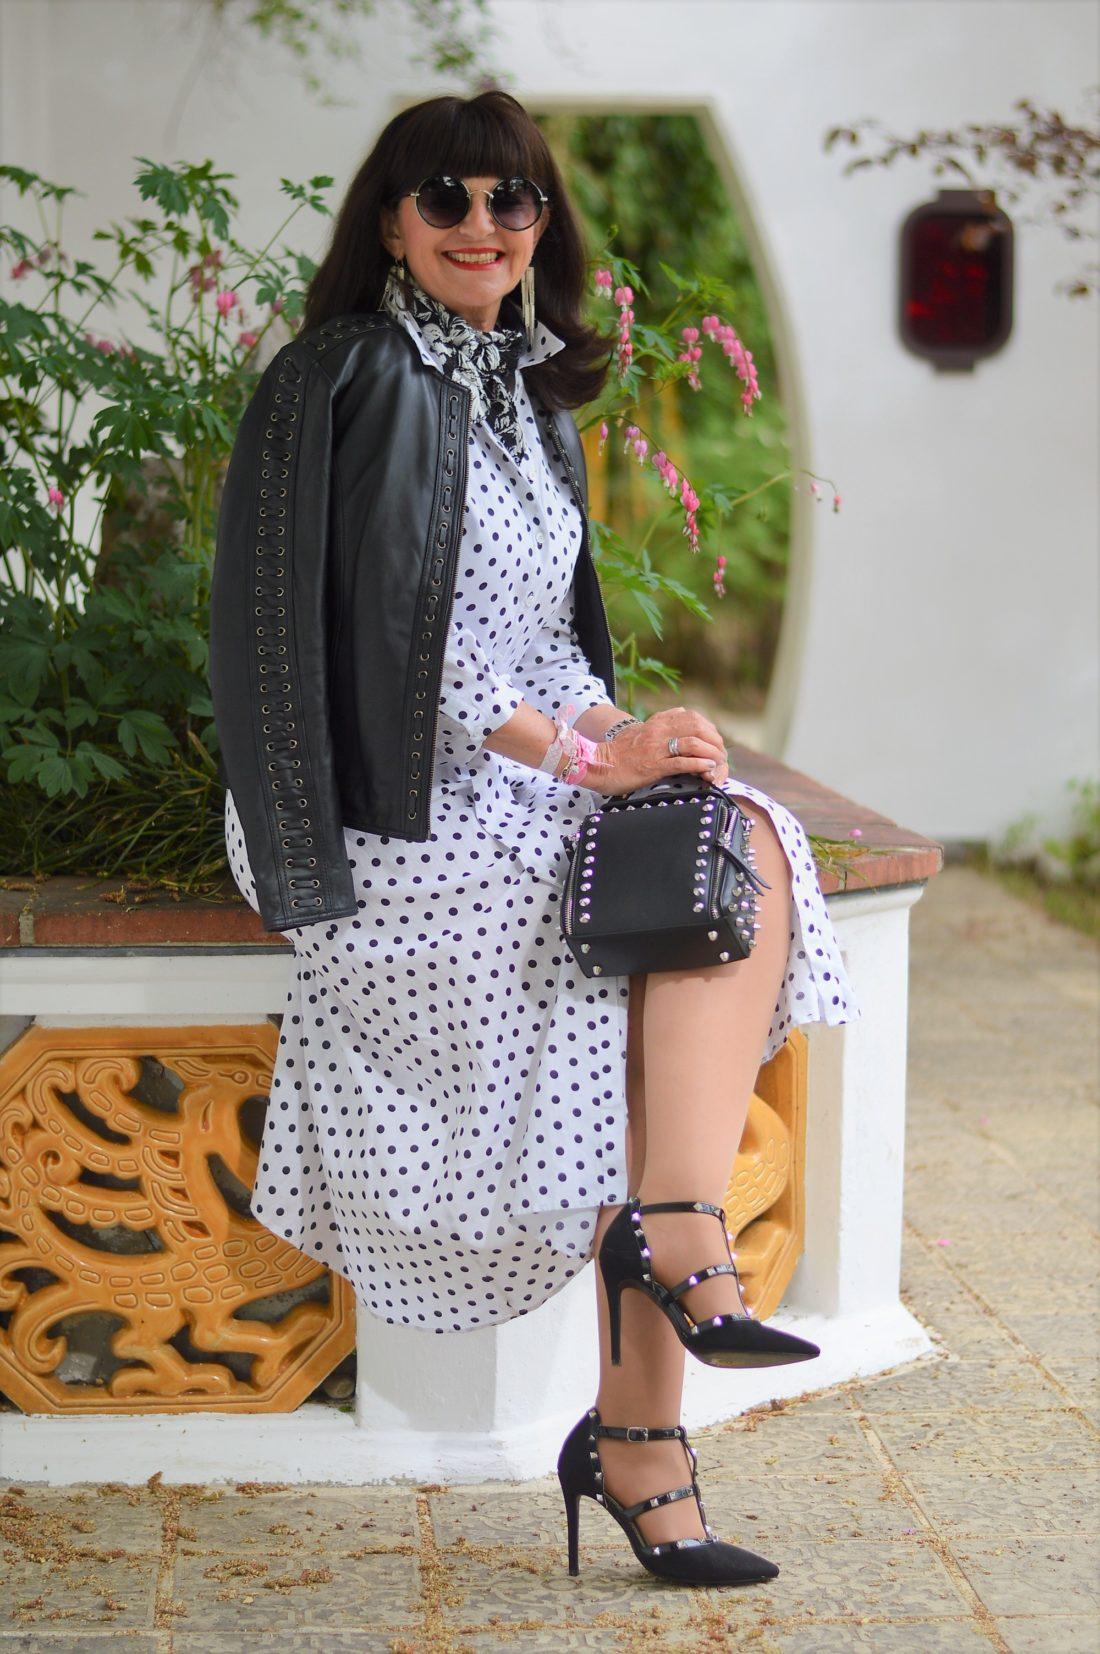 6e9d319d8a5483 Hemdblusenkleid mit Polka Dots – 4 Styling Tipps auf den Punkt gebracht